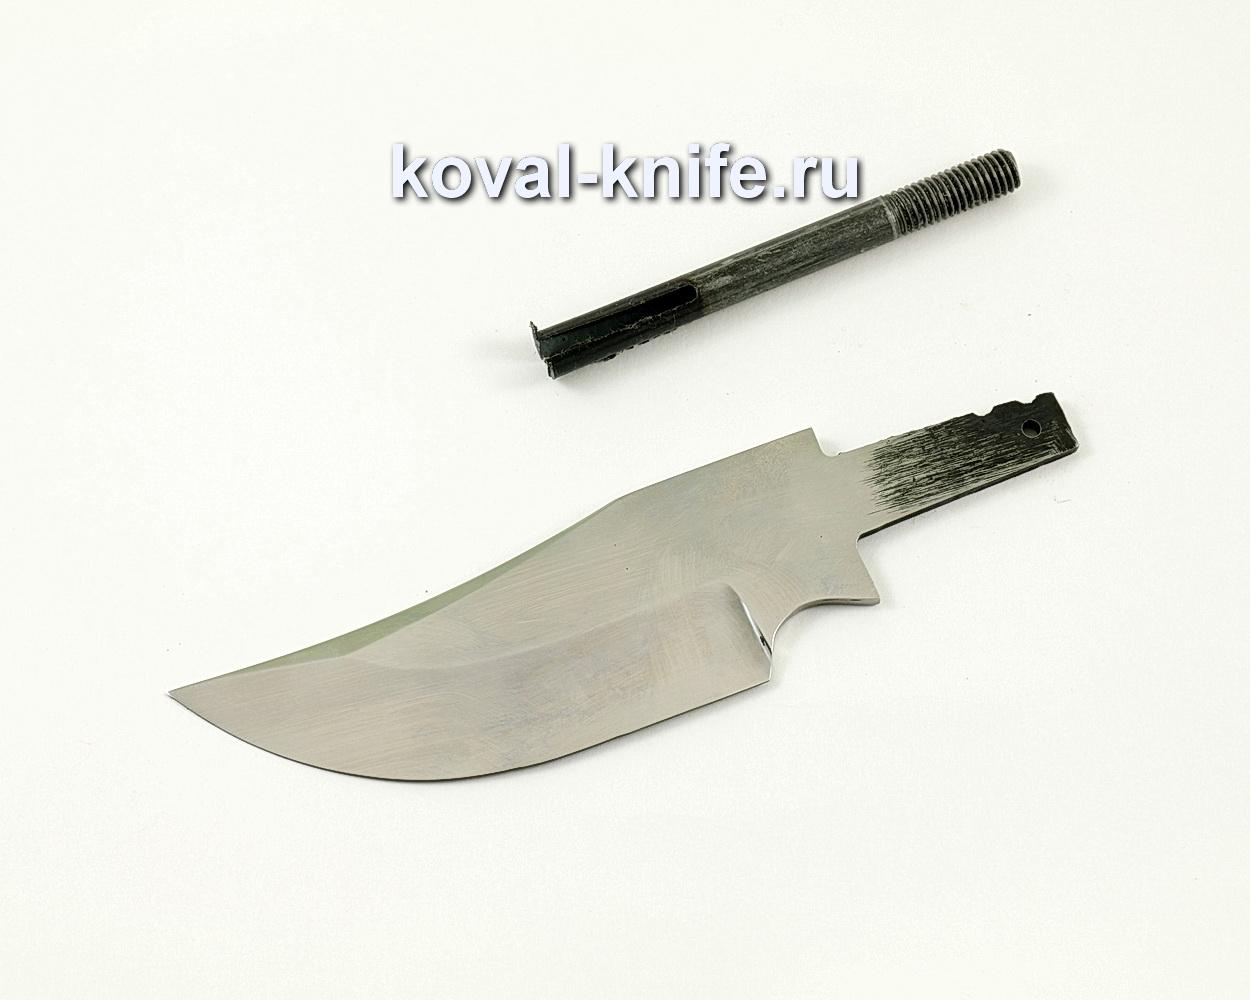 Клинок для ножа Бекас (кованая сталь 95Х18)